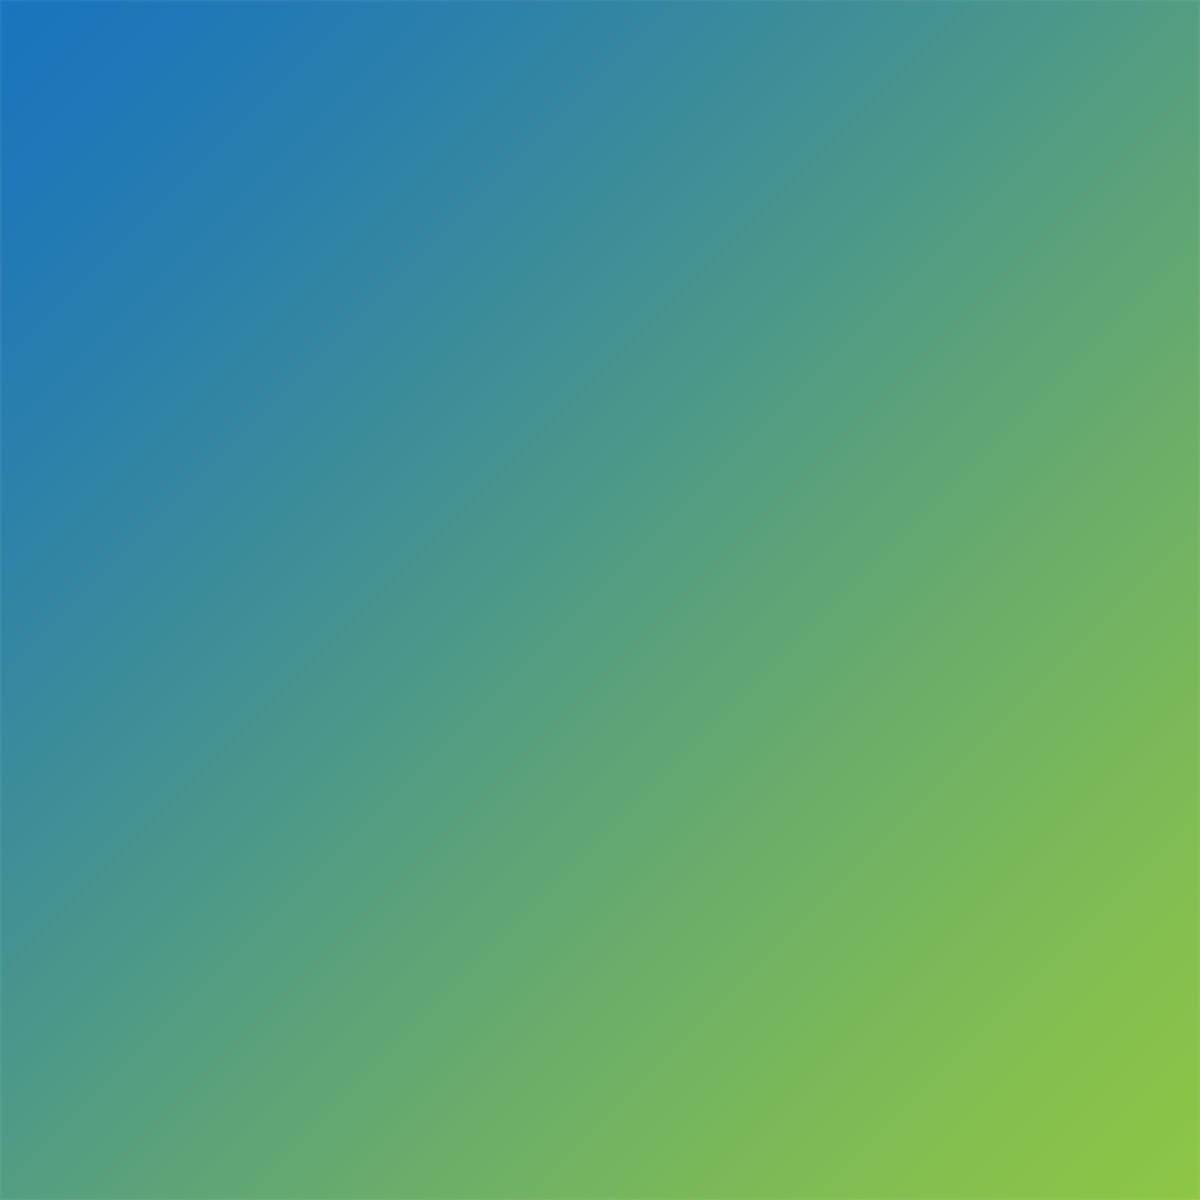 https://travelicious.bold-themes.com/main-demo/wp-content/uploads/sites/2/2018/09/bgn-image-box-gradient.jpg